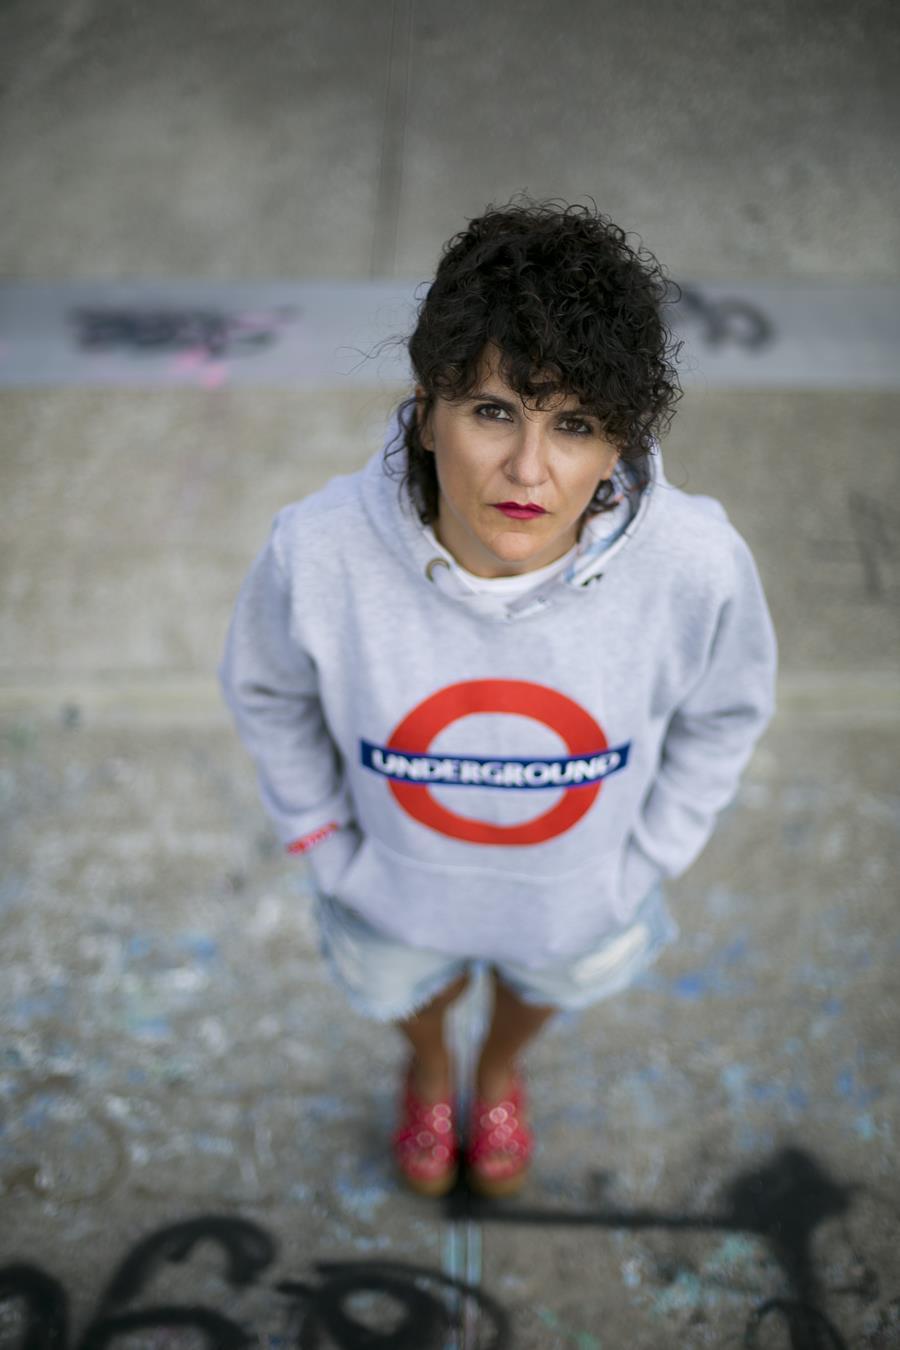 Rebeca Valdivia, asesora de imagen, personal shopper, influencer, Donostia, San Sebastián, Miss Clov, la blogger indie, Lasarte, street style, ootd, moño y vermut, short, denim, underground, sudadera, cuñas, Alpe, tachuelas